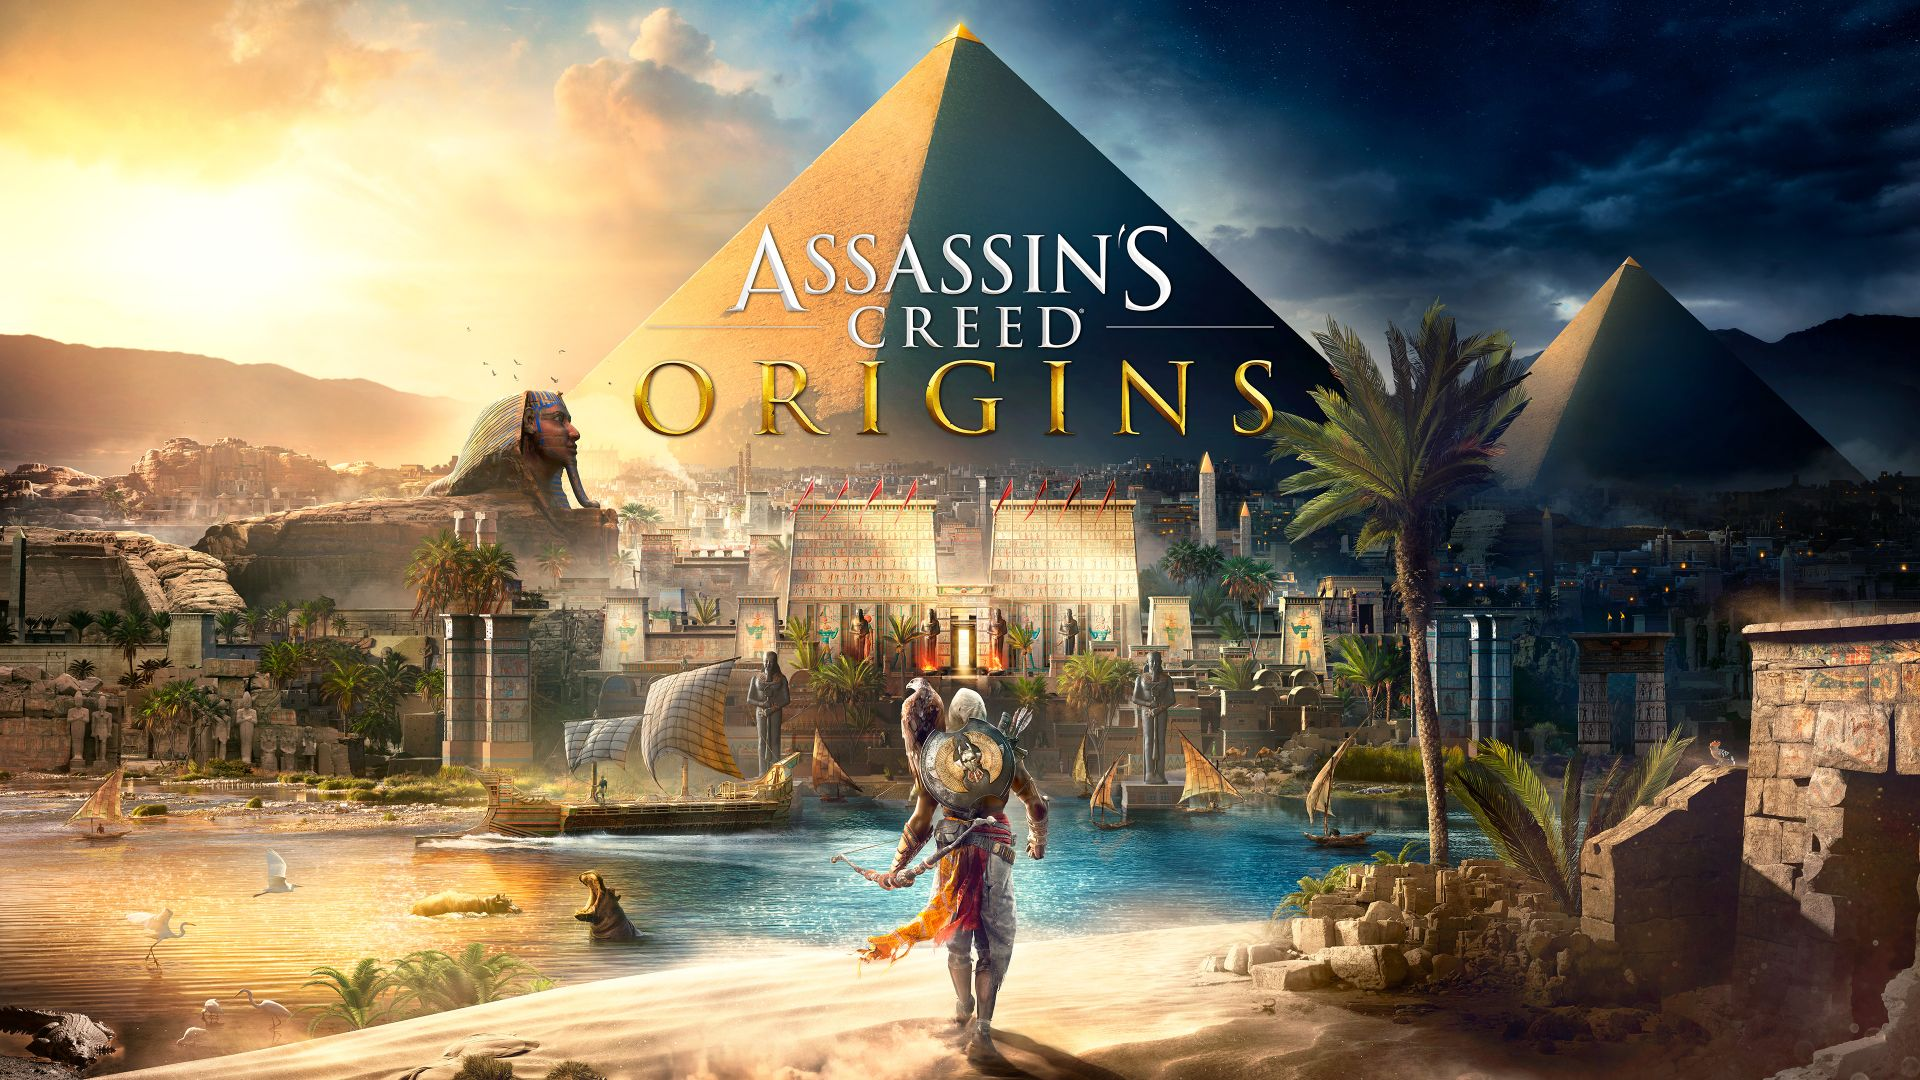 Wallpaper Assassin's Creed Origins, video game, pyramids, 4k